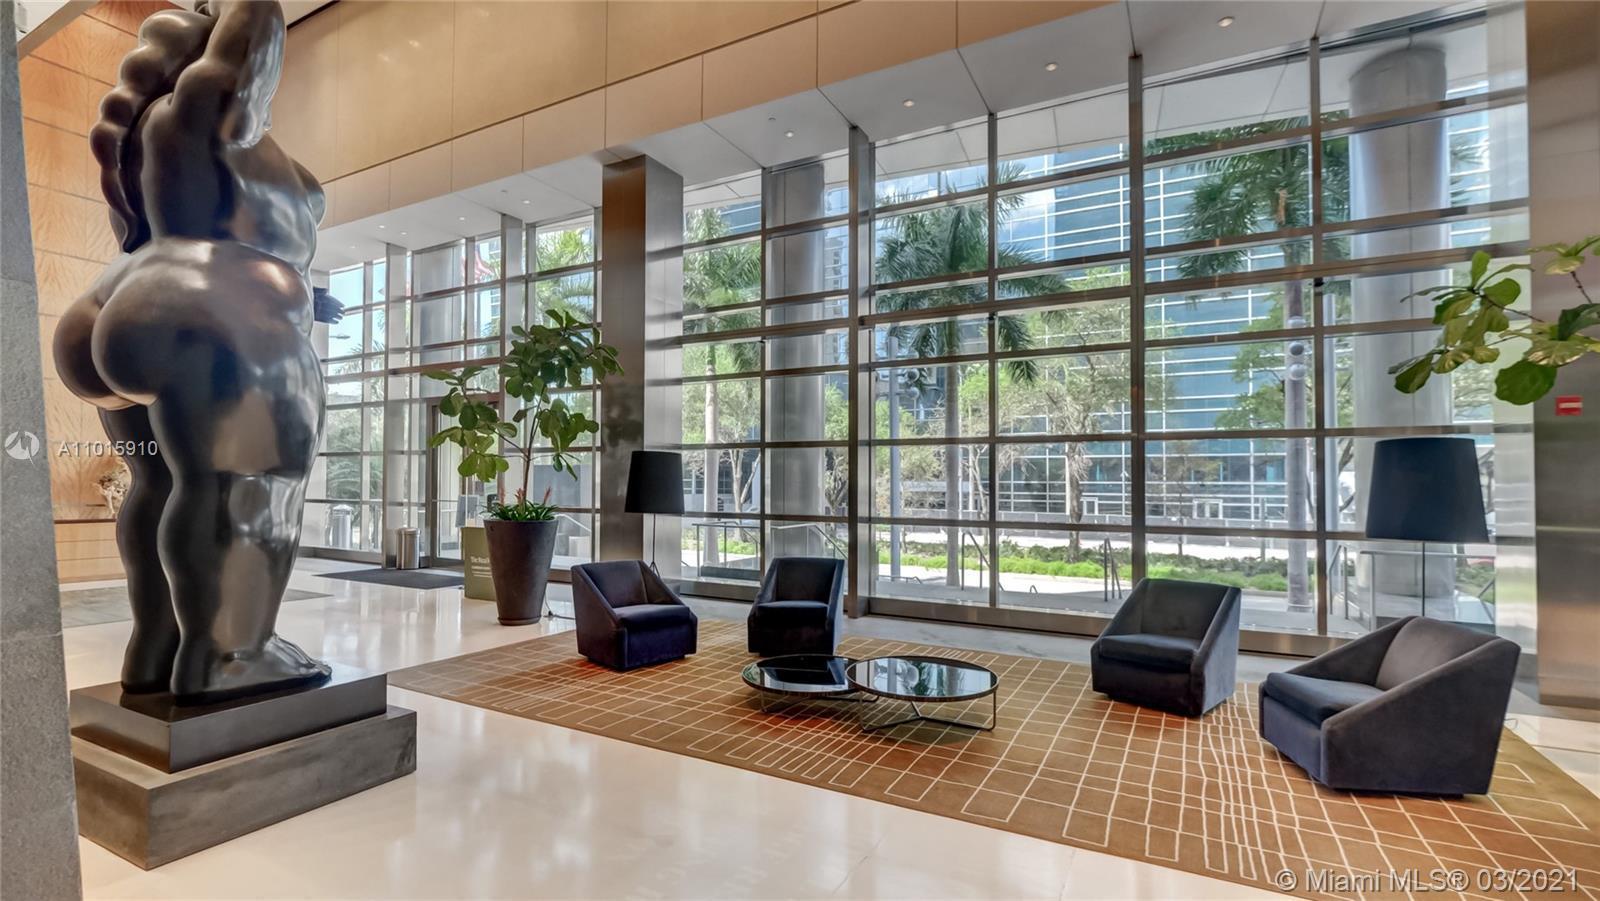 Four Seasons Residences - Condos for sale